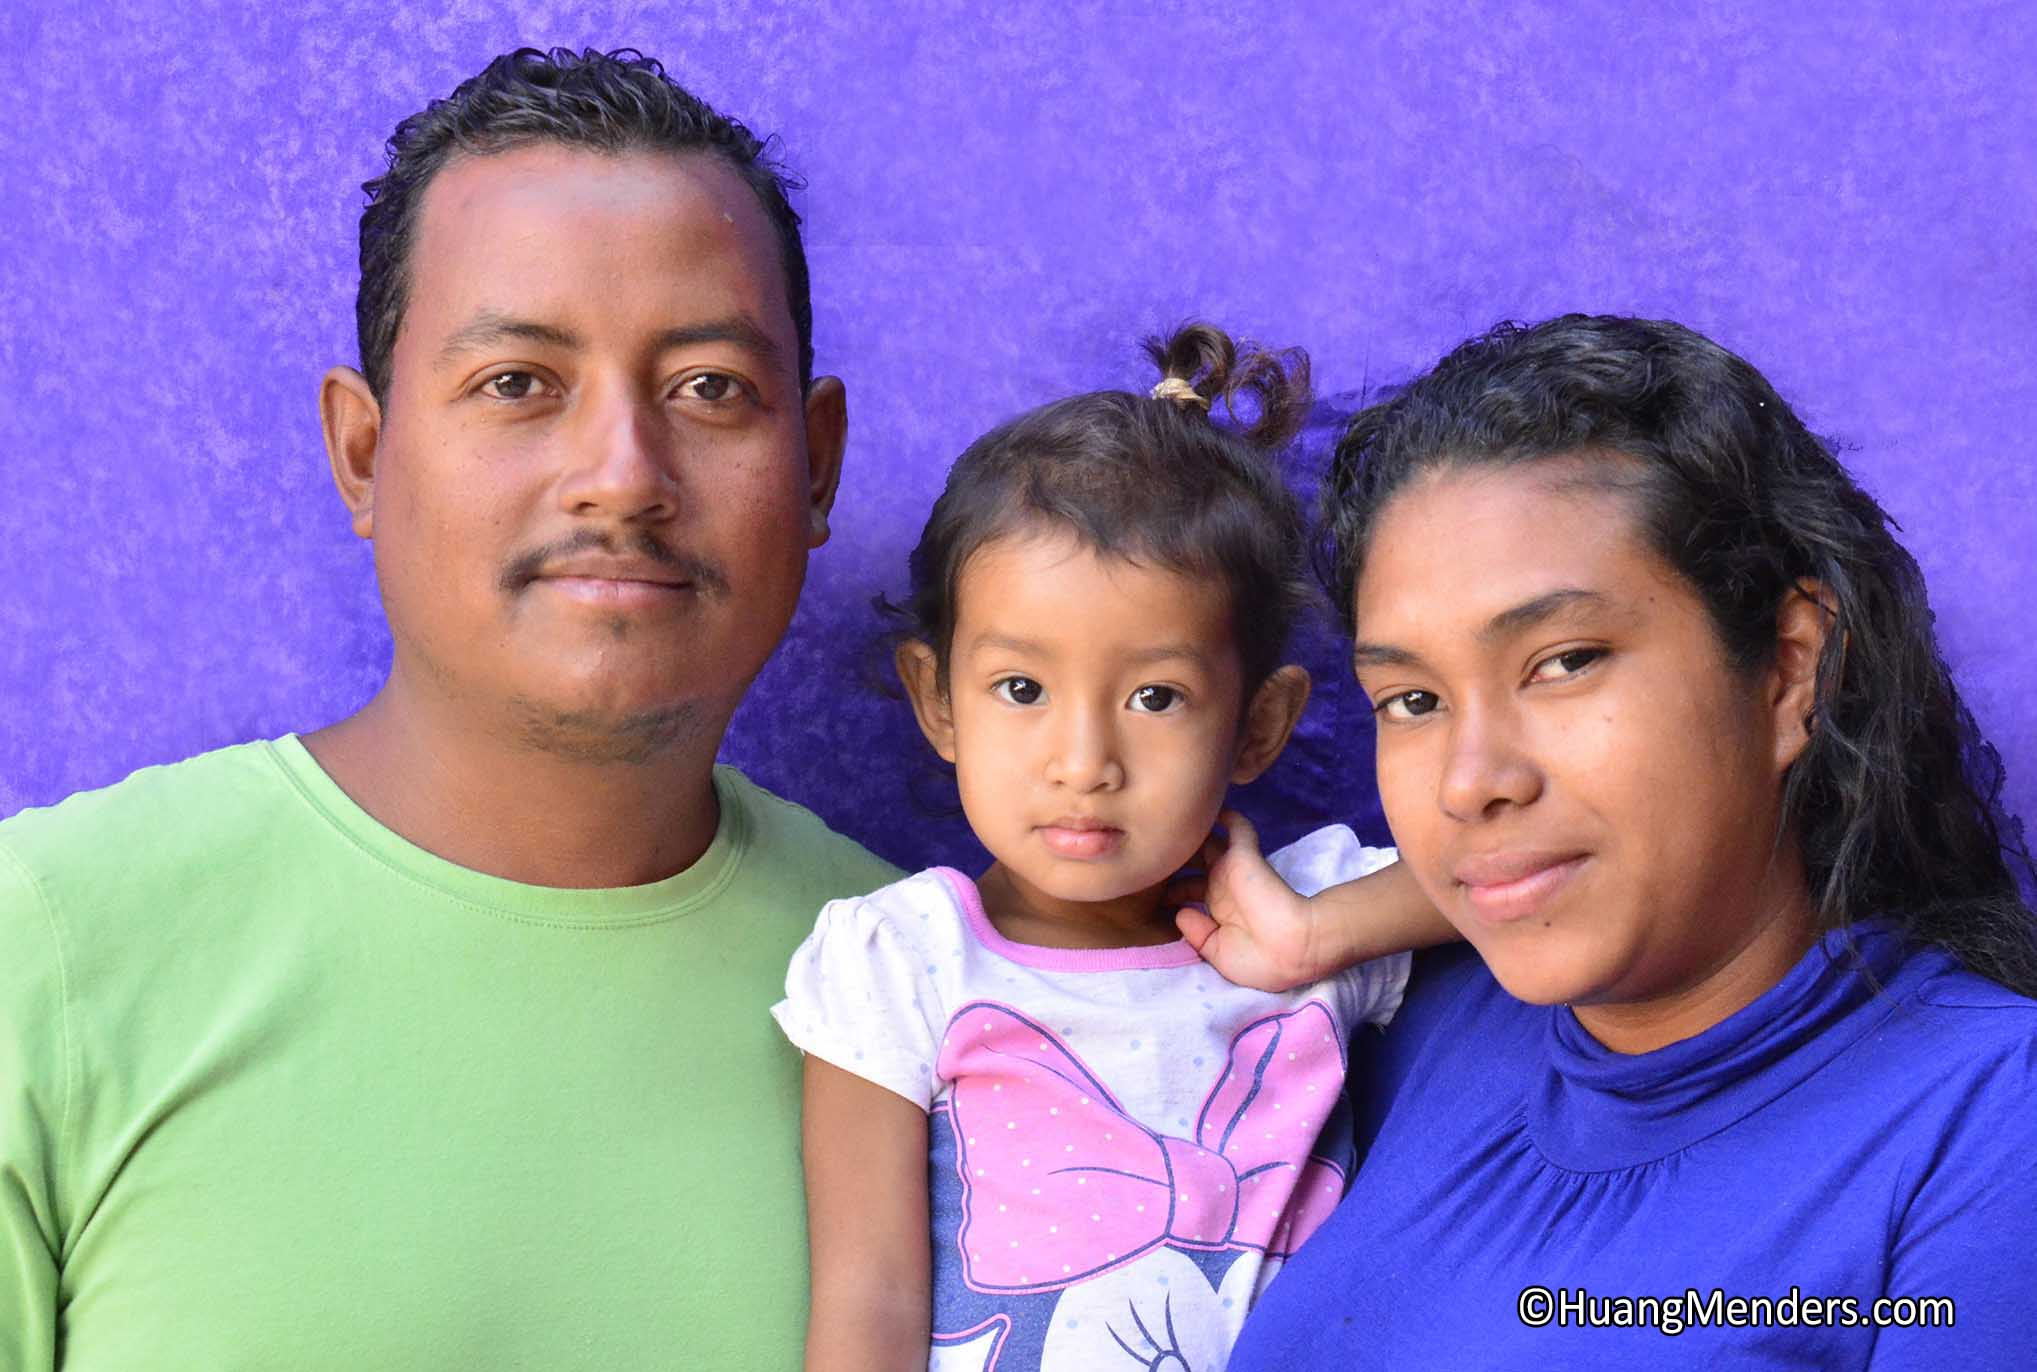 HuangMenders Tijuana 104 LLR WM